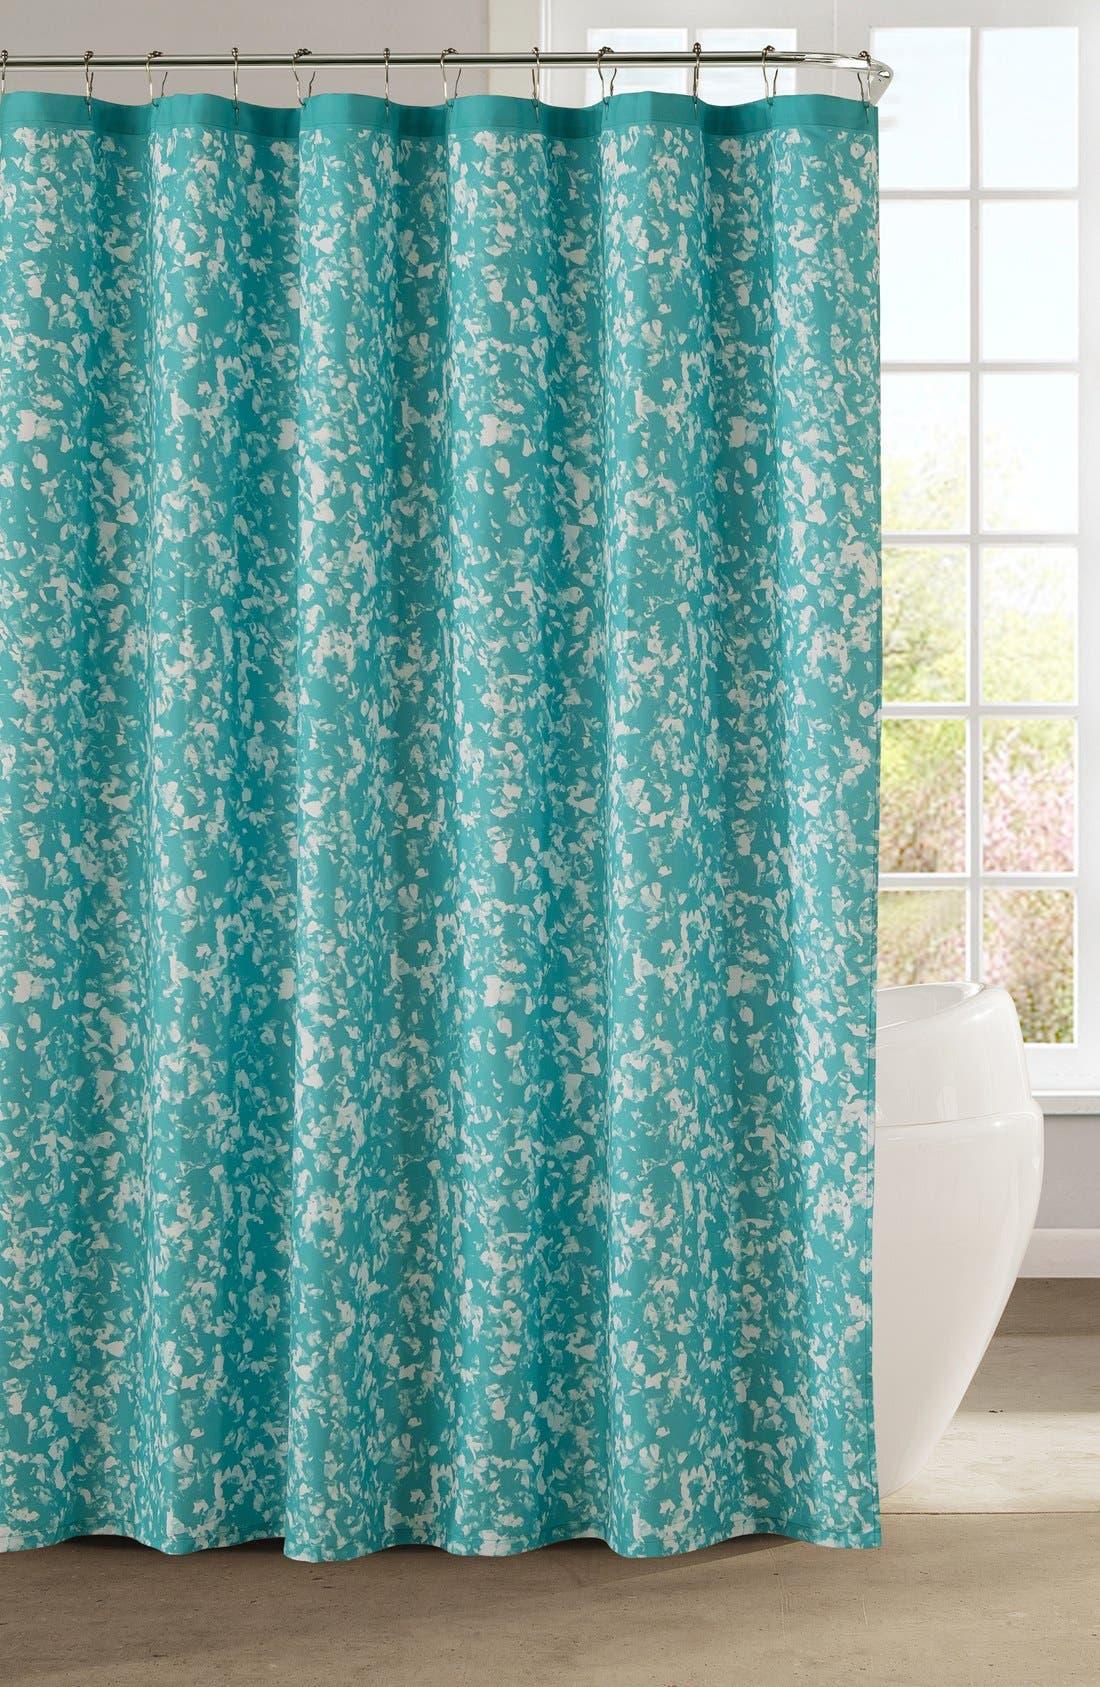 'Susie' Shower Curtain,                             Main thumbnail 1, color,                             Hazy Aqua